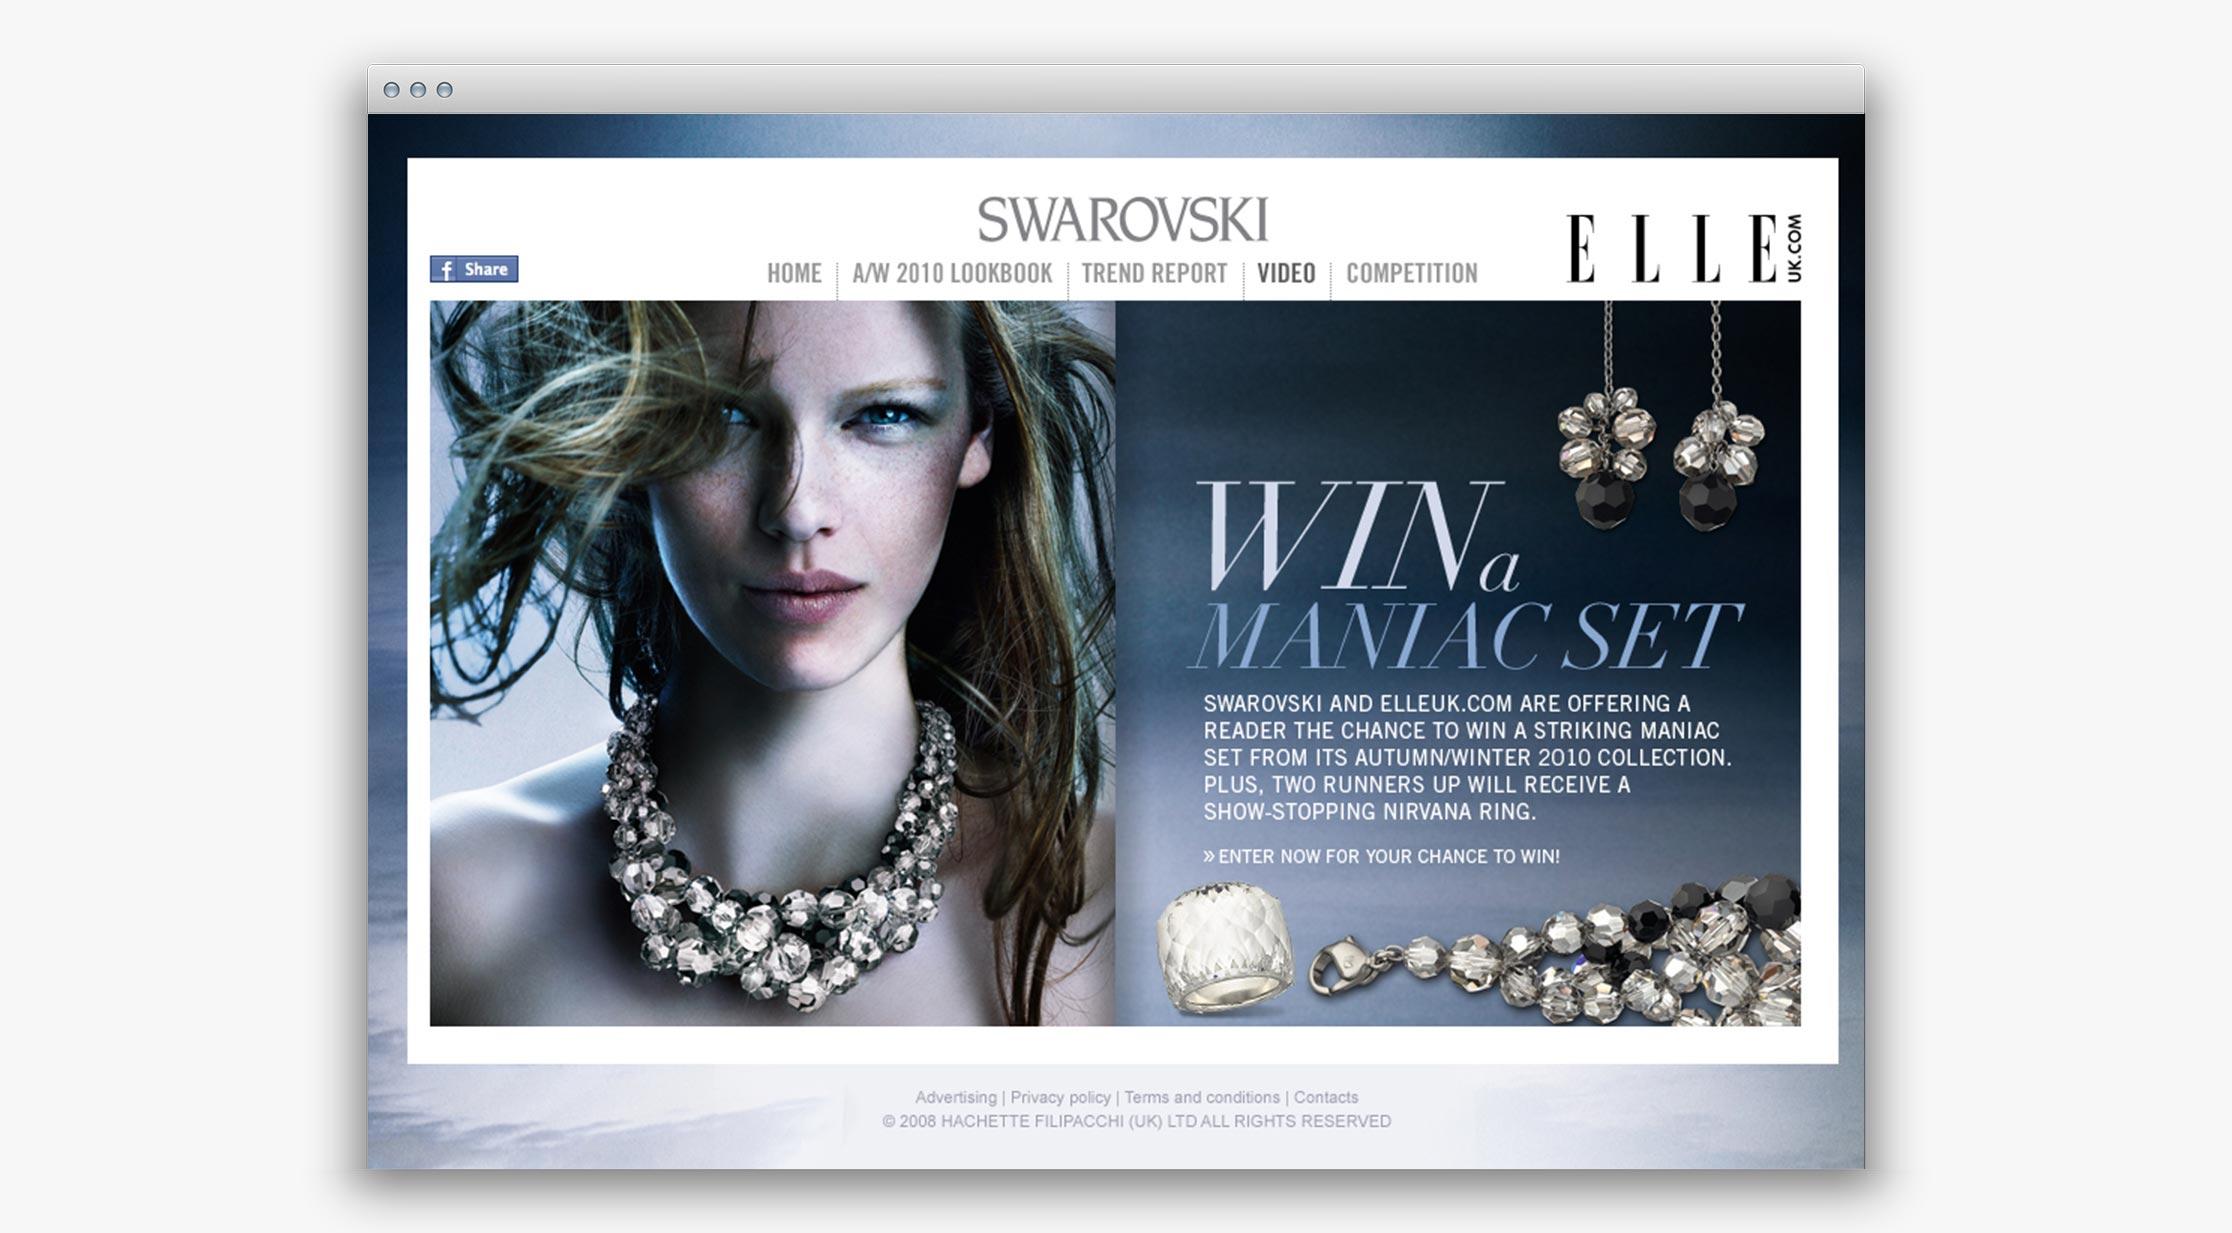 ElleUk-Swarovski-Competition.jpg